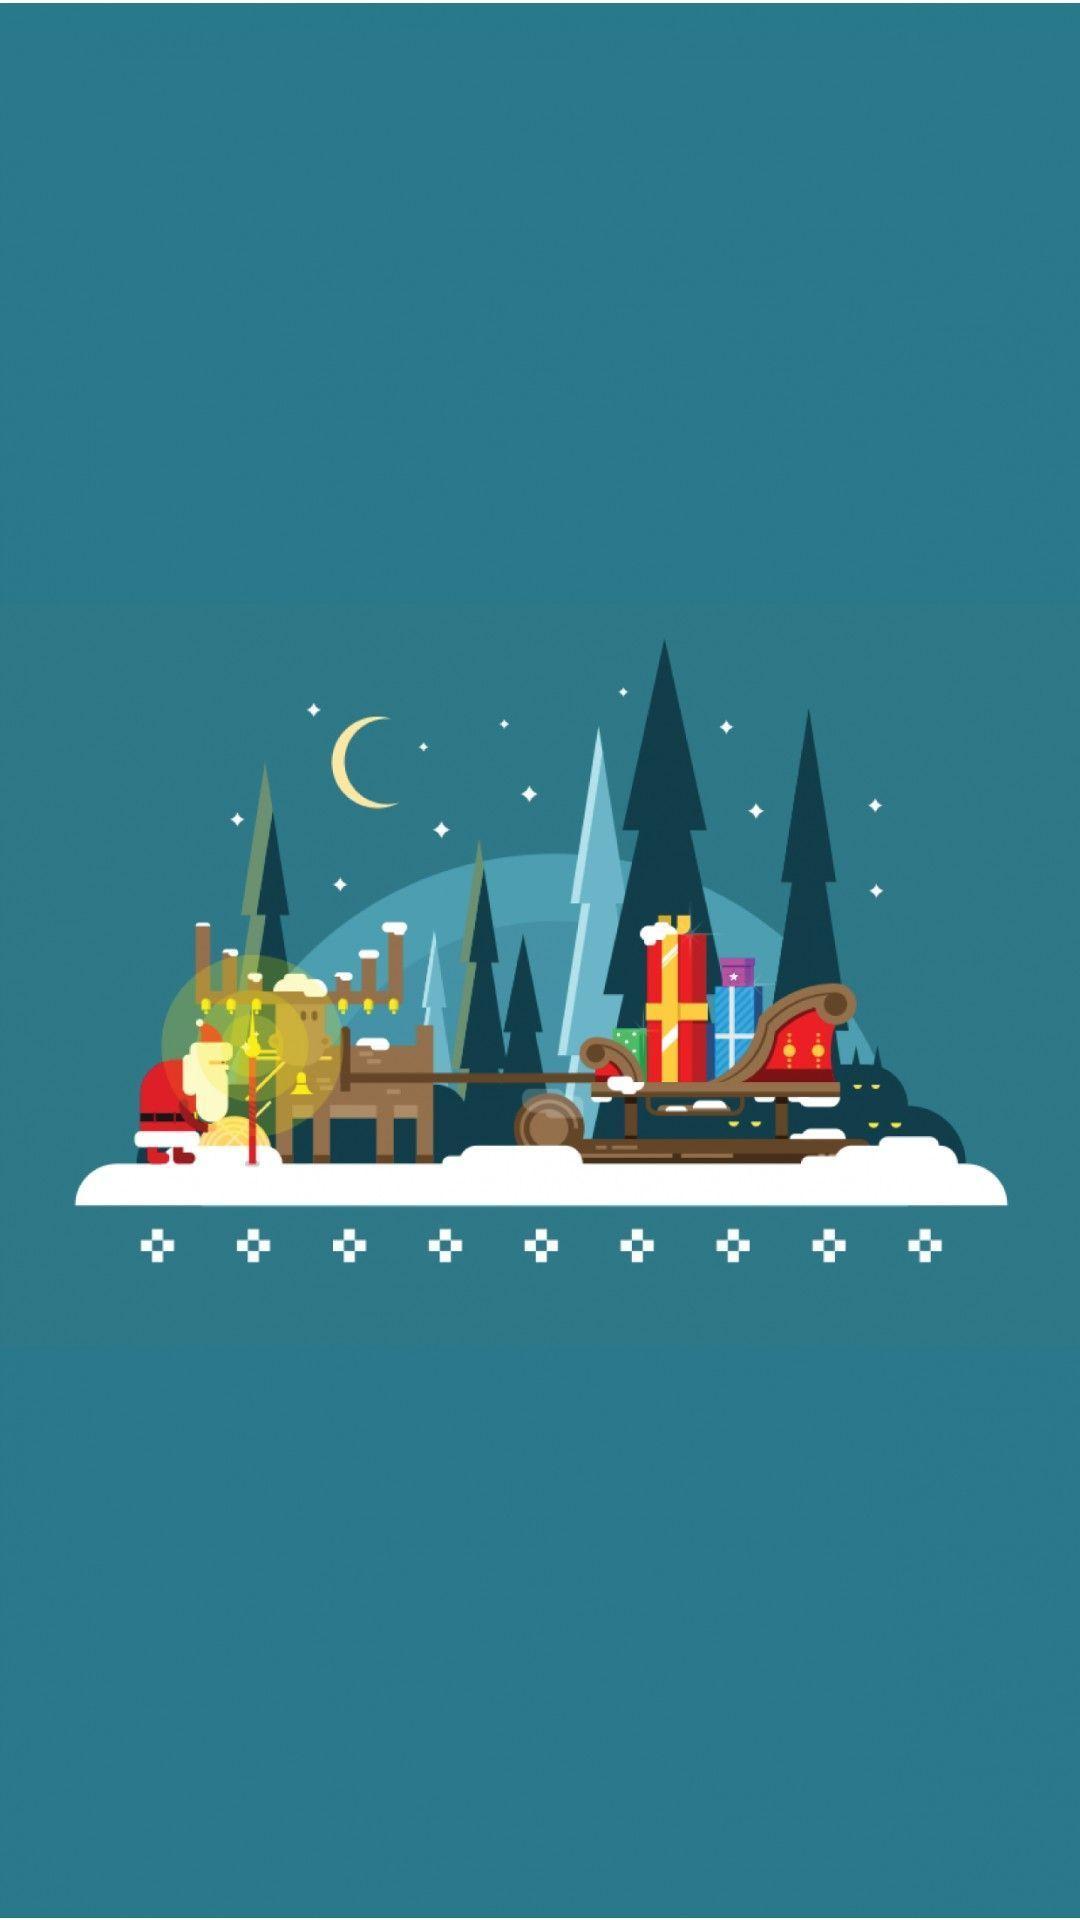 40 Minimalist Christmas Wallpapers For Desktop And Iphone Wallpaper Iphone Christmas Christmas Wallpaper Tree Wallpaper Iphone